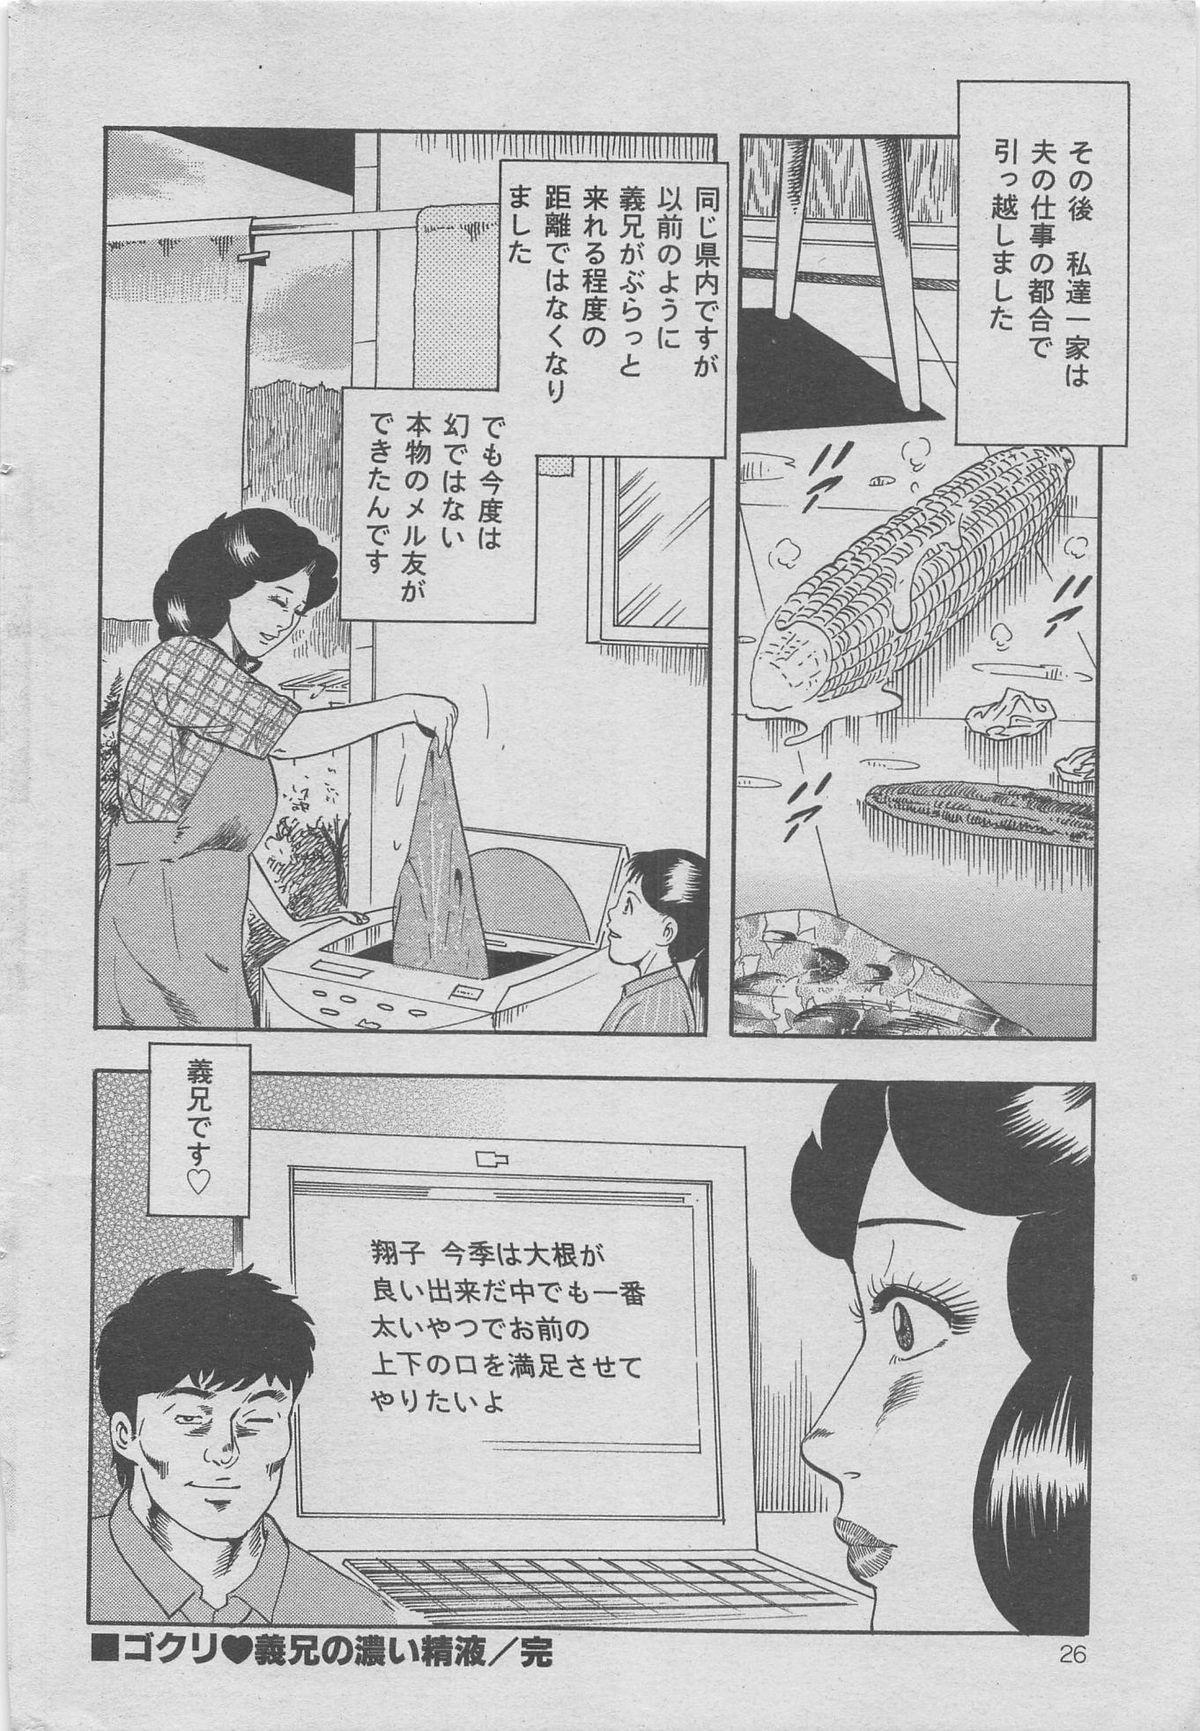 Hontou ni Atta Kindanai vol.7 21